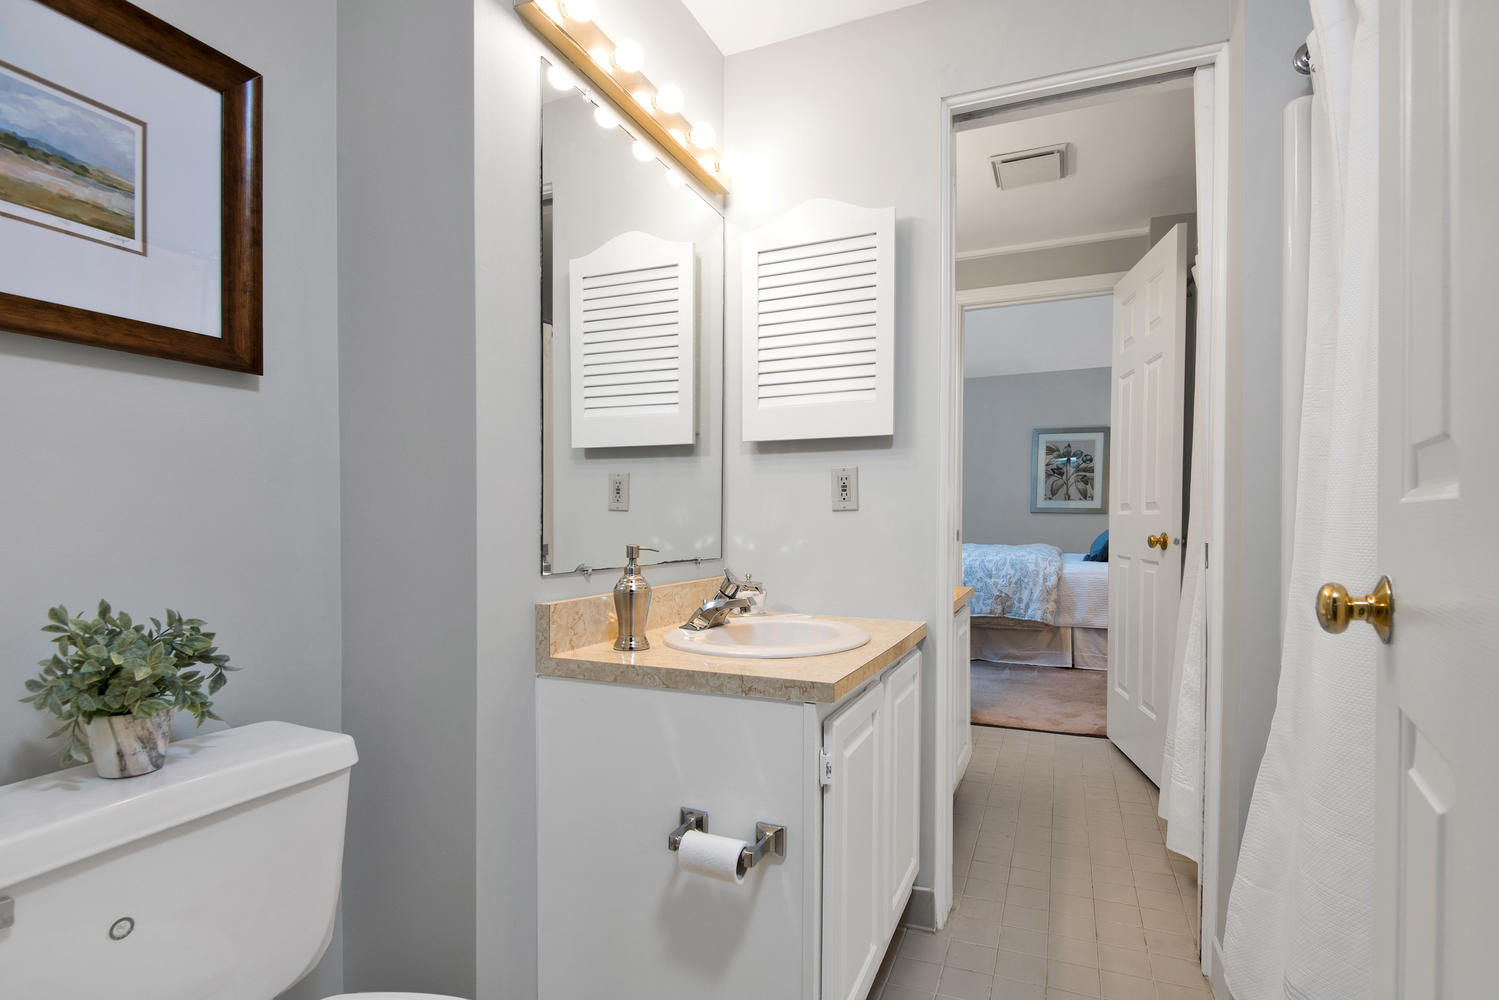 11 Crestfield Terrace Portland-large-030-38-Bedroom 2 Ensuite-1499x1000-72dpi_1.jpg